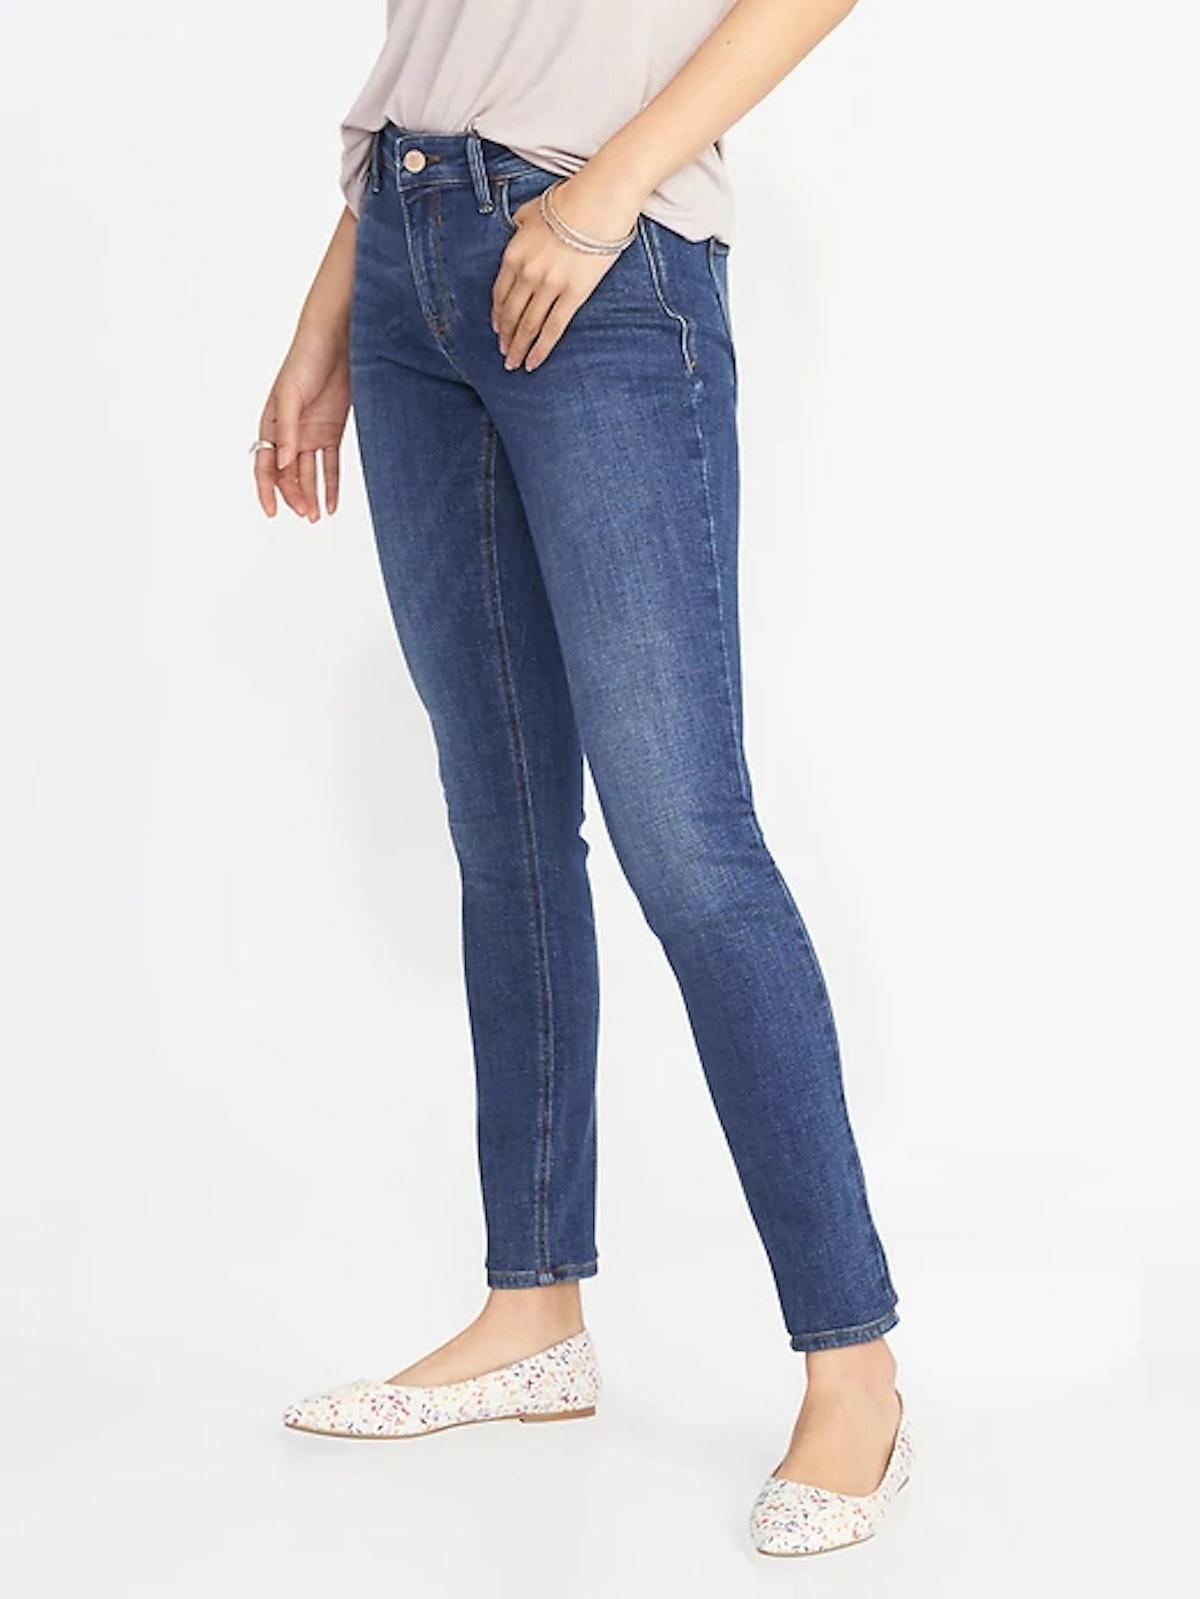 Mid-Rise Super Skinny Rockstar Jeans for Women